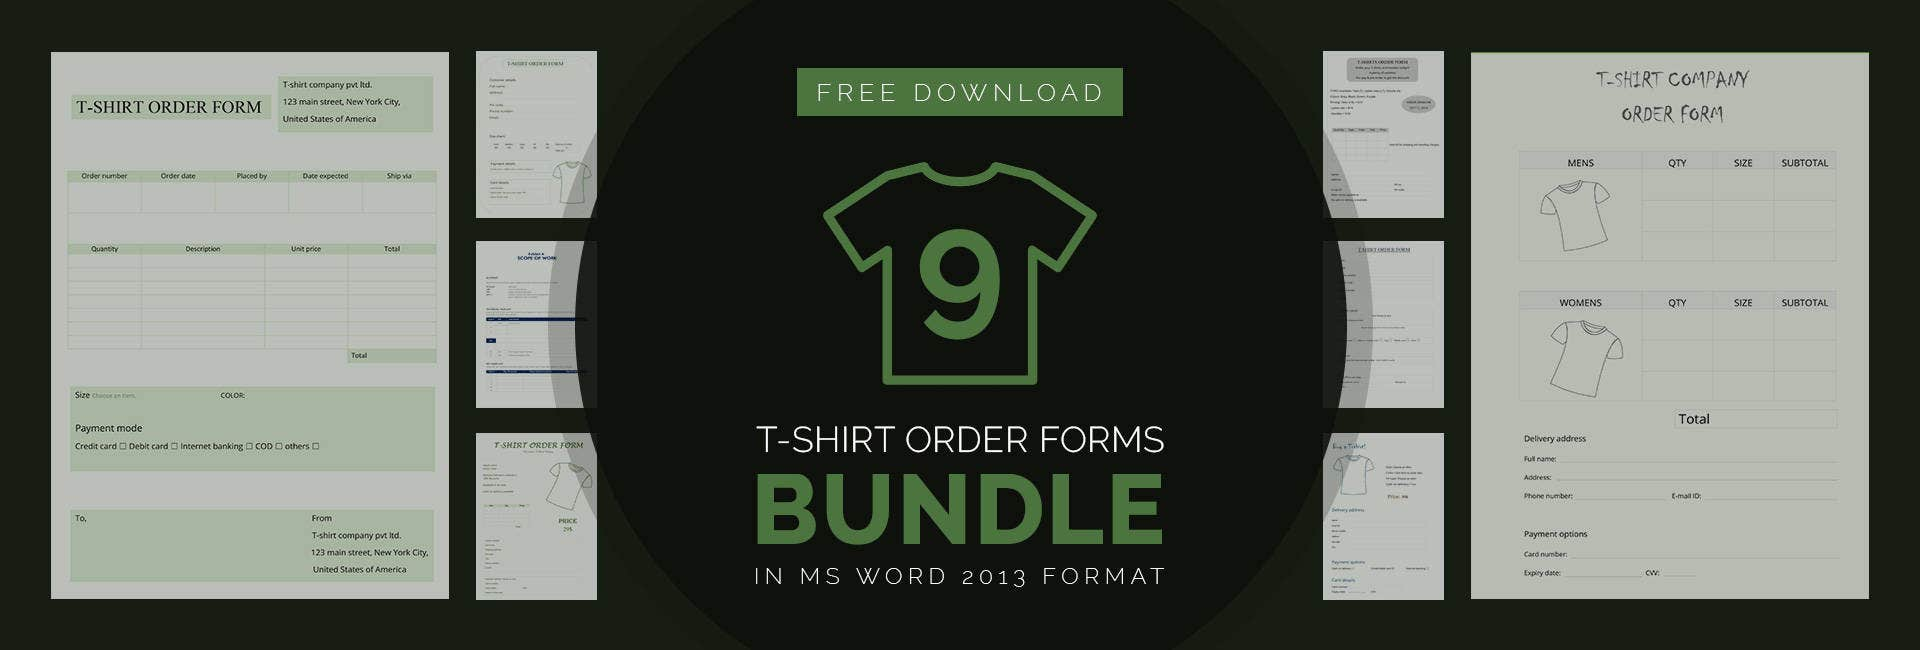 27tshirt_order_forms_bundle